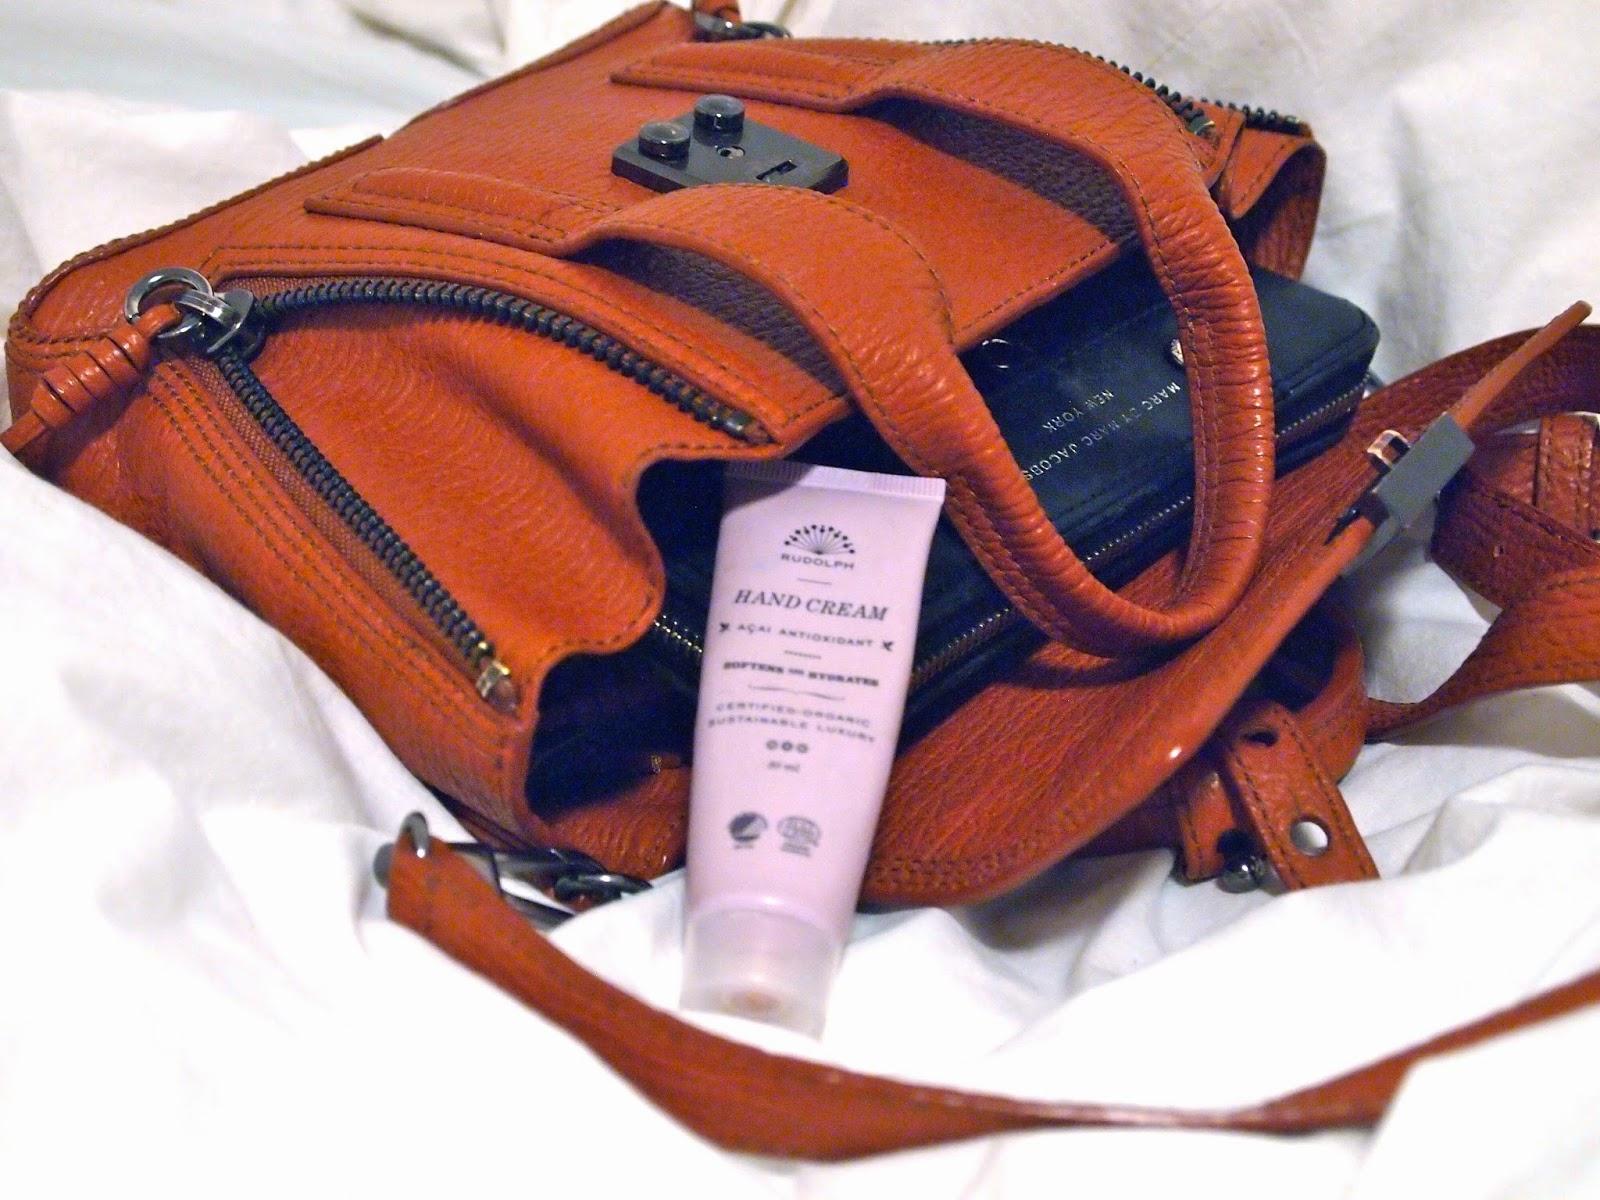 Rudolp Care Acai Hand Cream